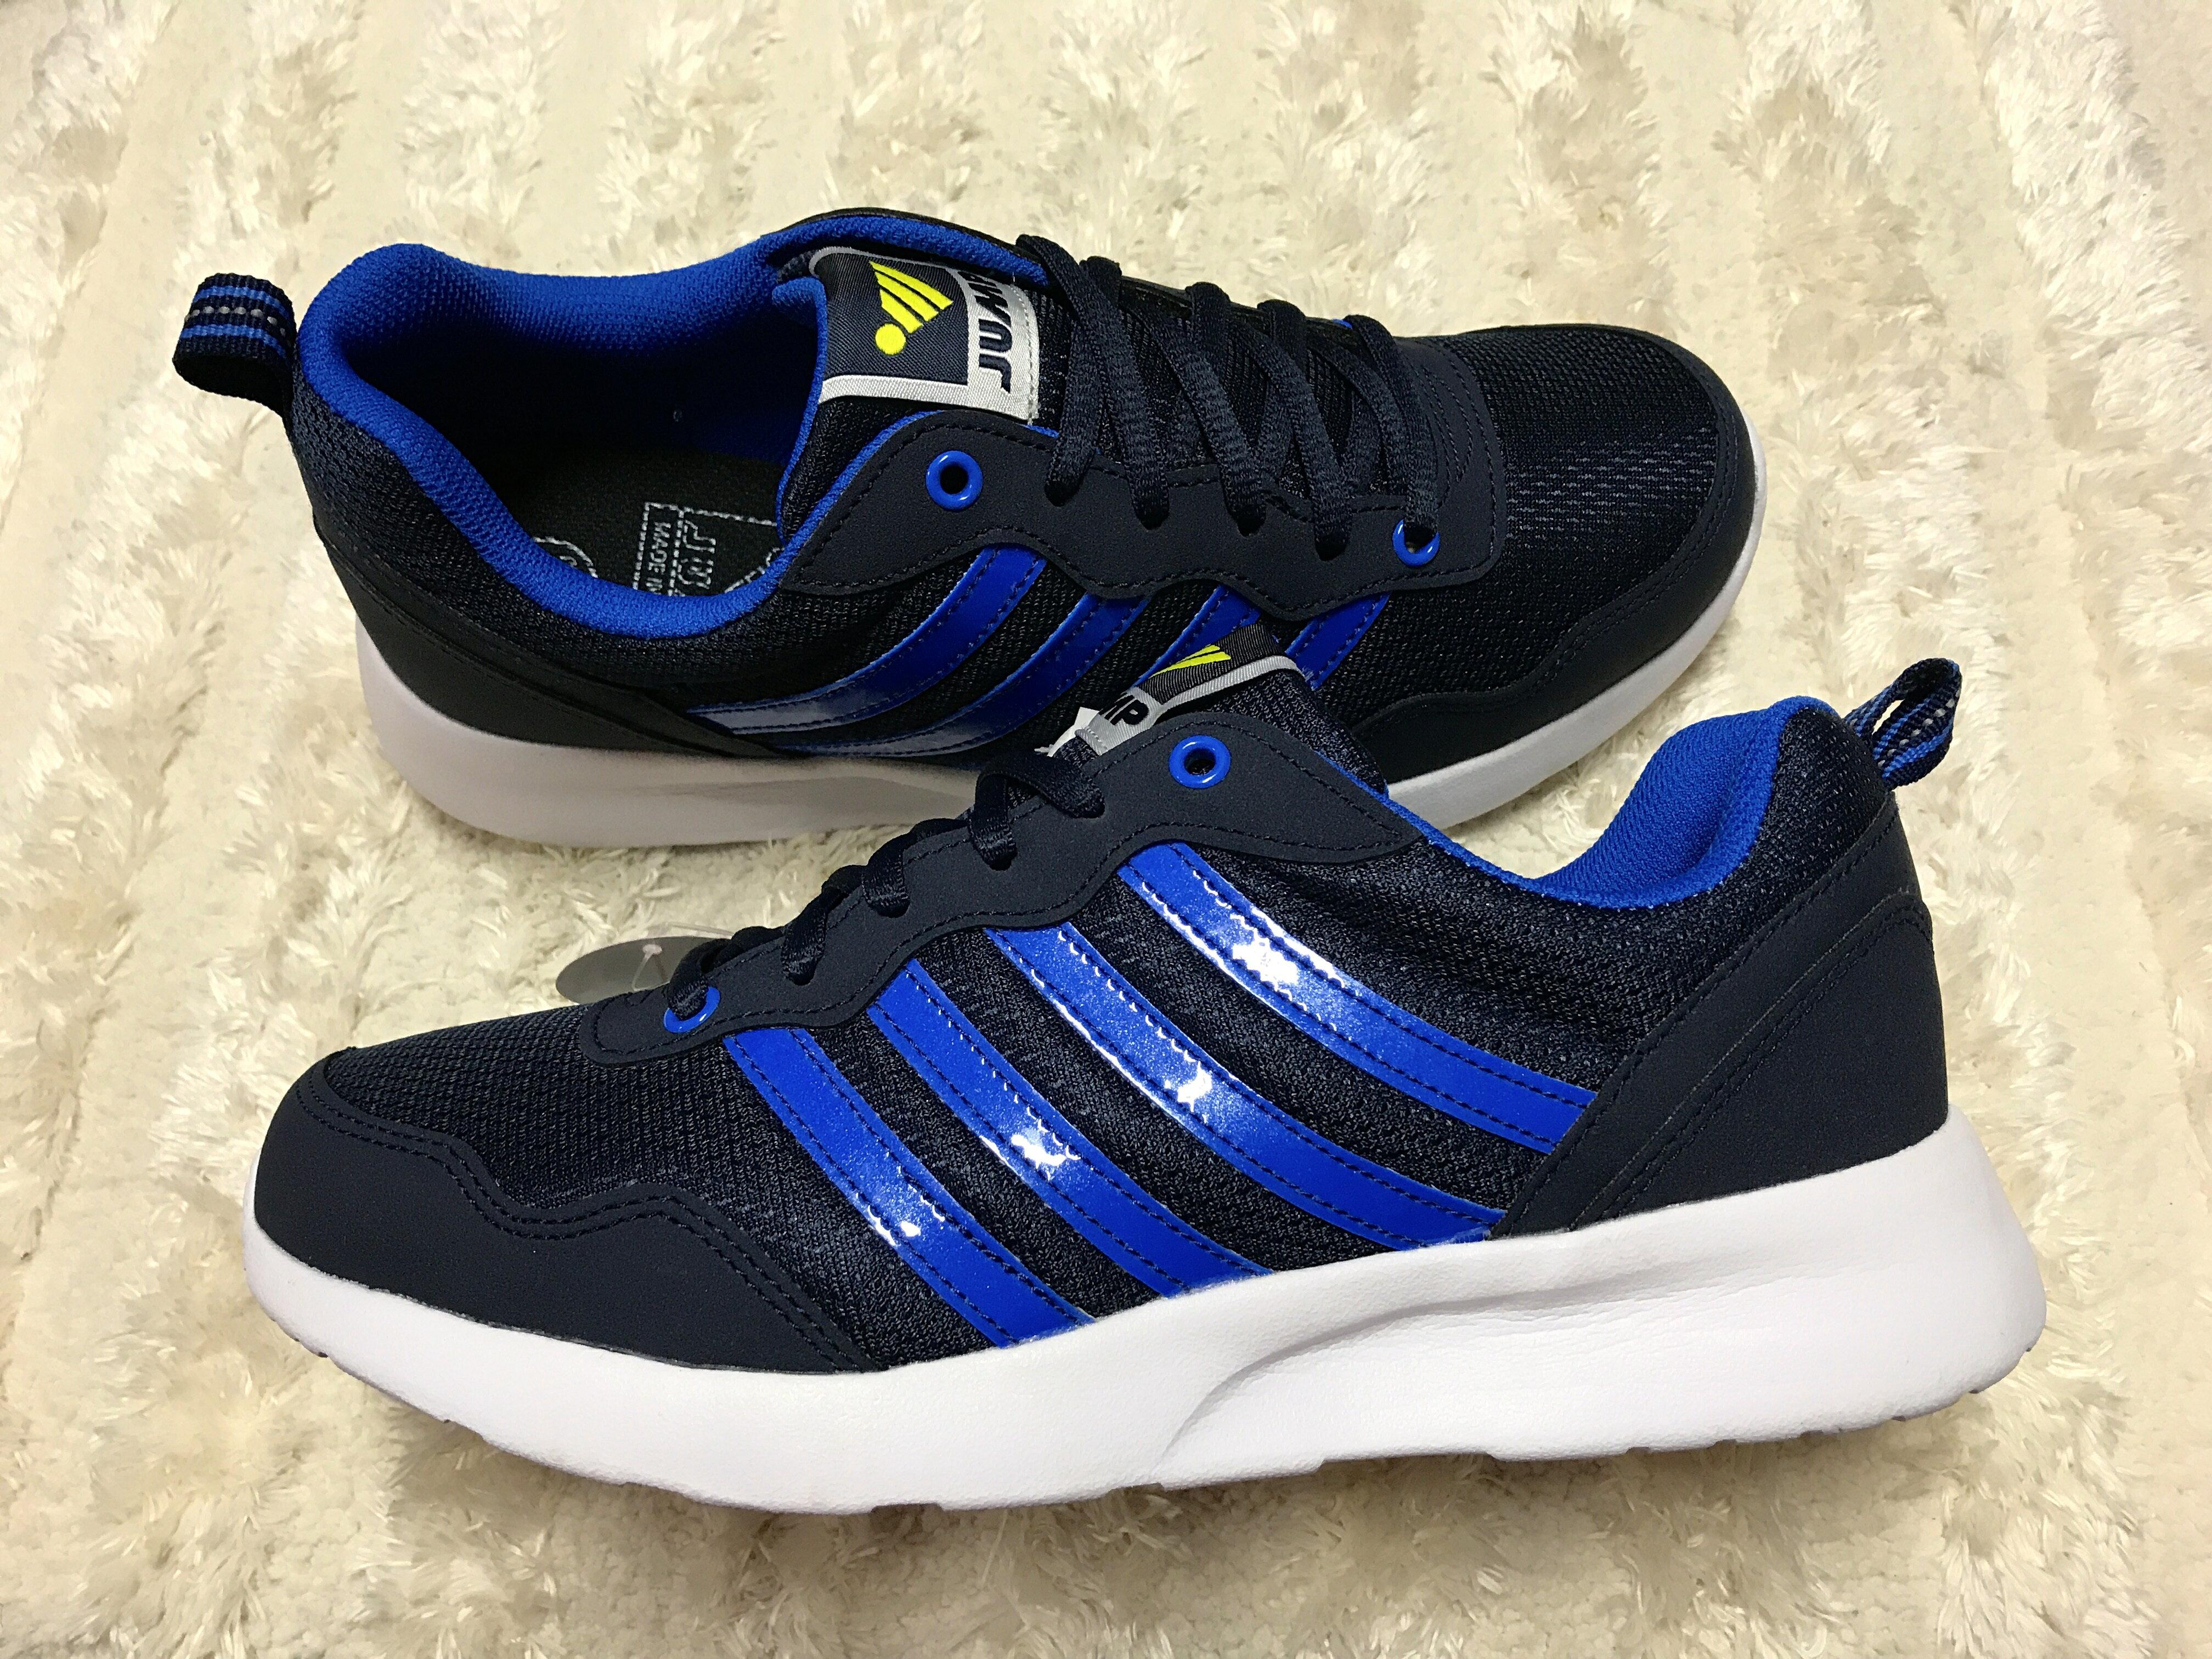 【Jolove】JUMP將門男鞋/台灣製MIT/透氣輕量彈性運動鞋3023